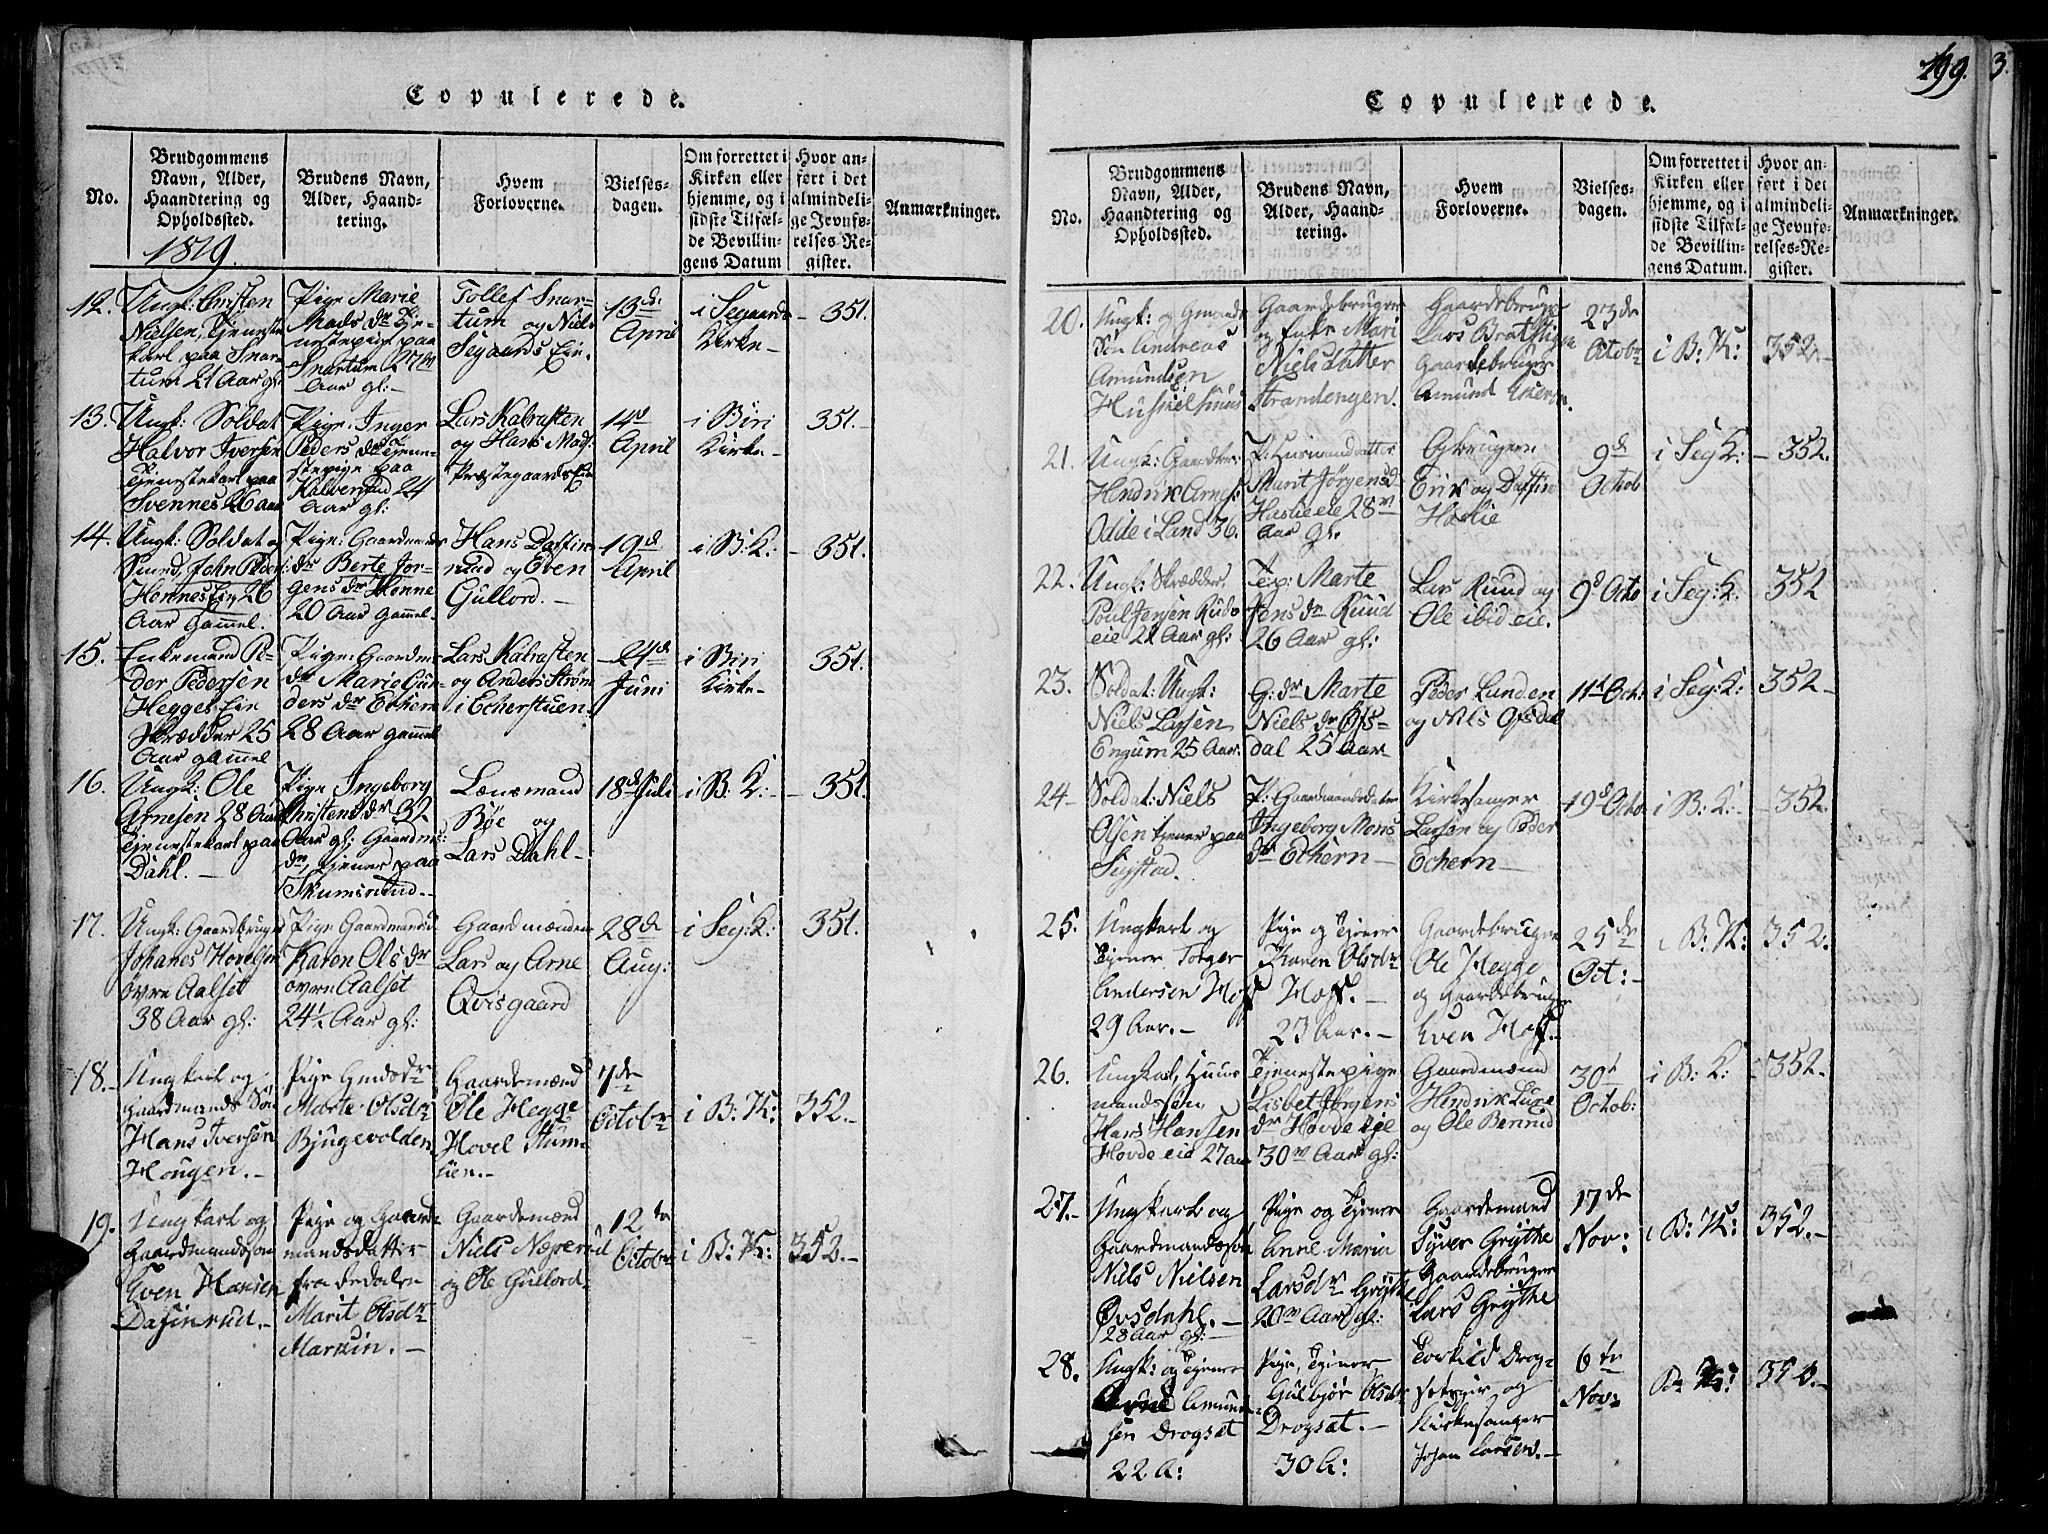 SAH, Biri prestekontor, Ministerialbok nr. 3, 1814-1828, s. 199